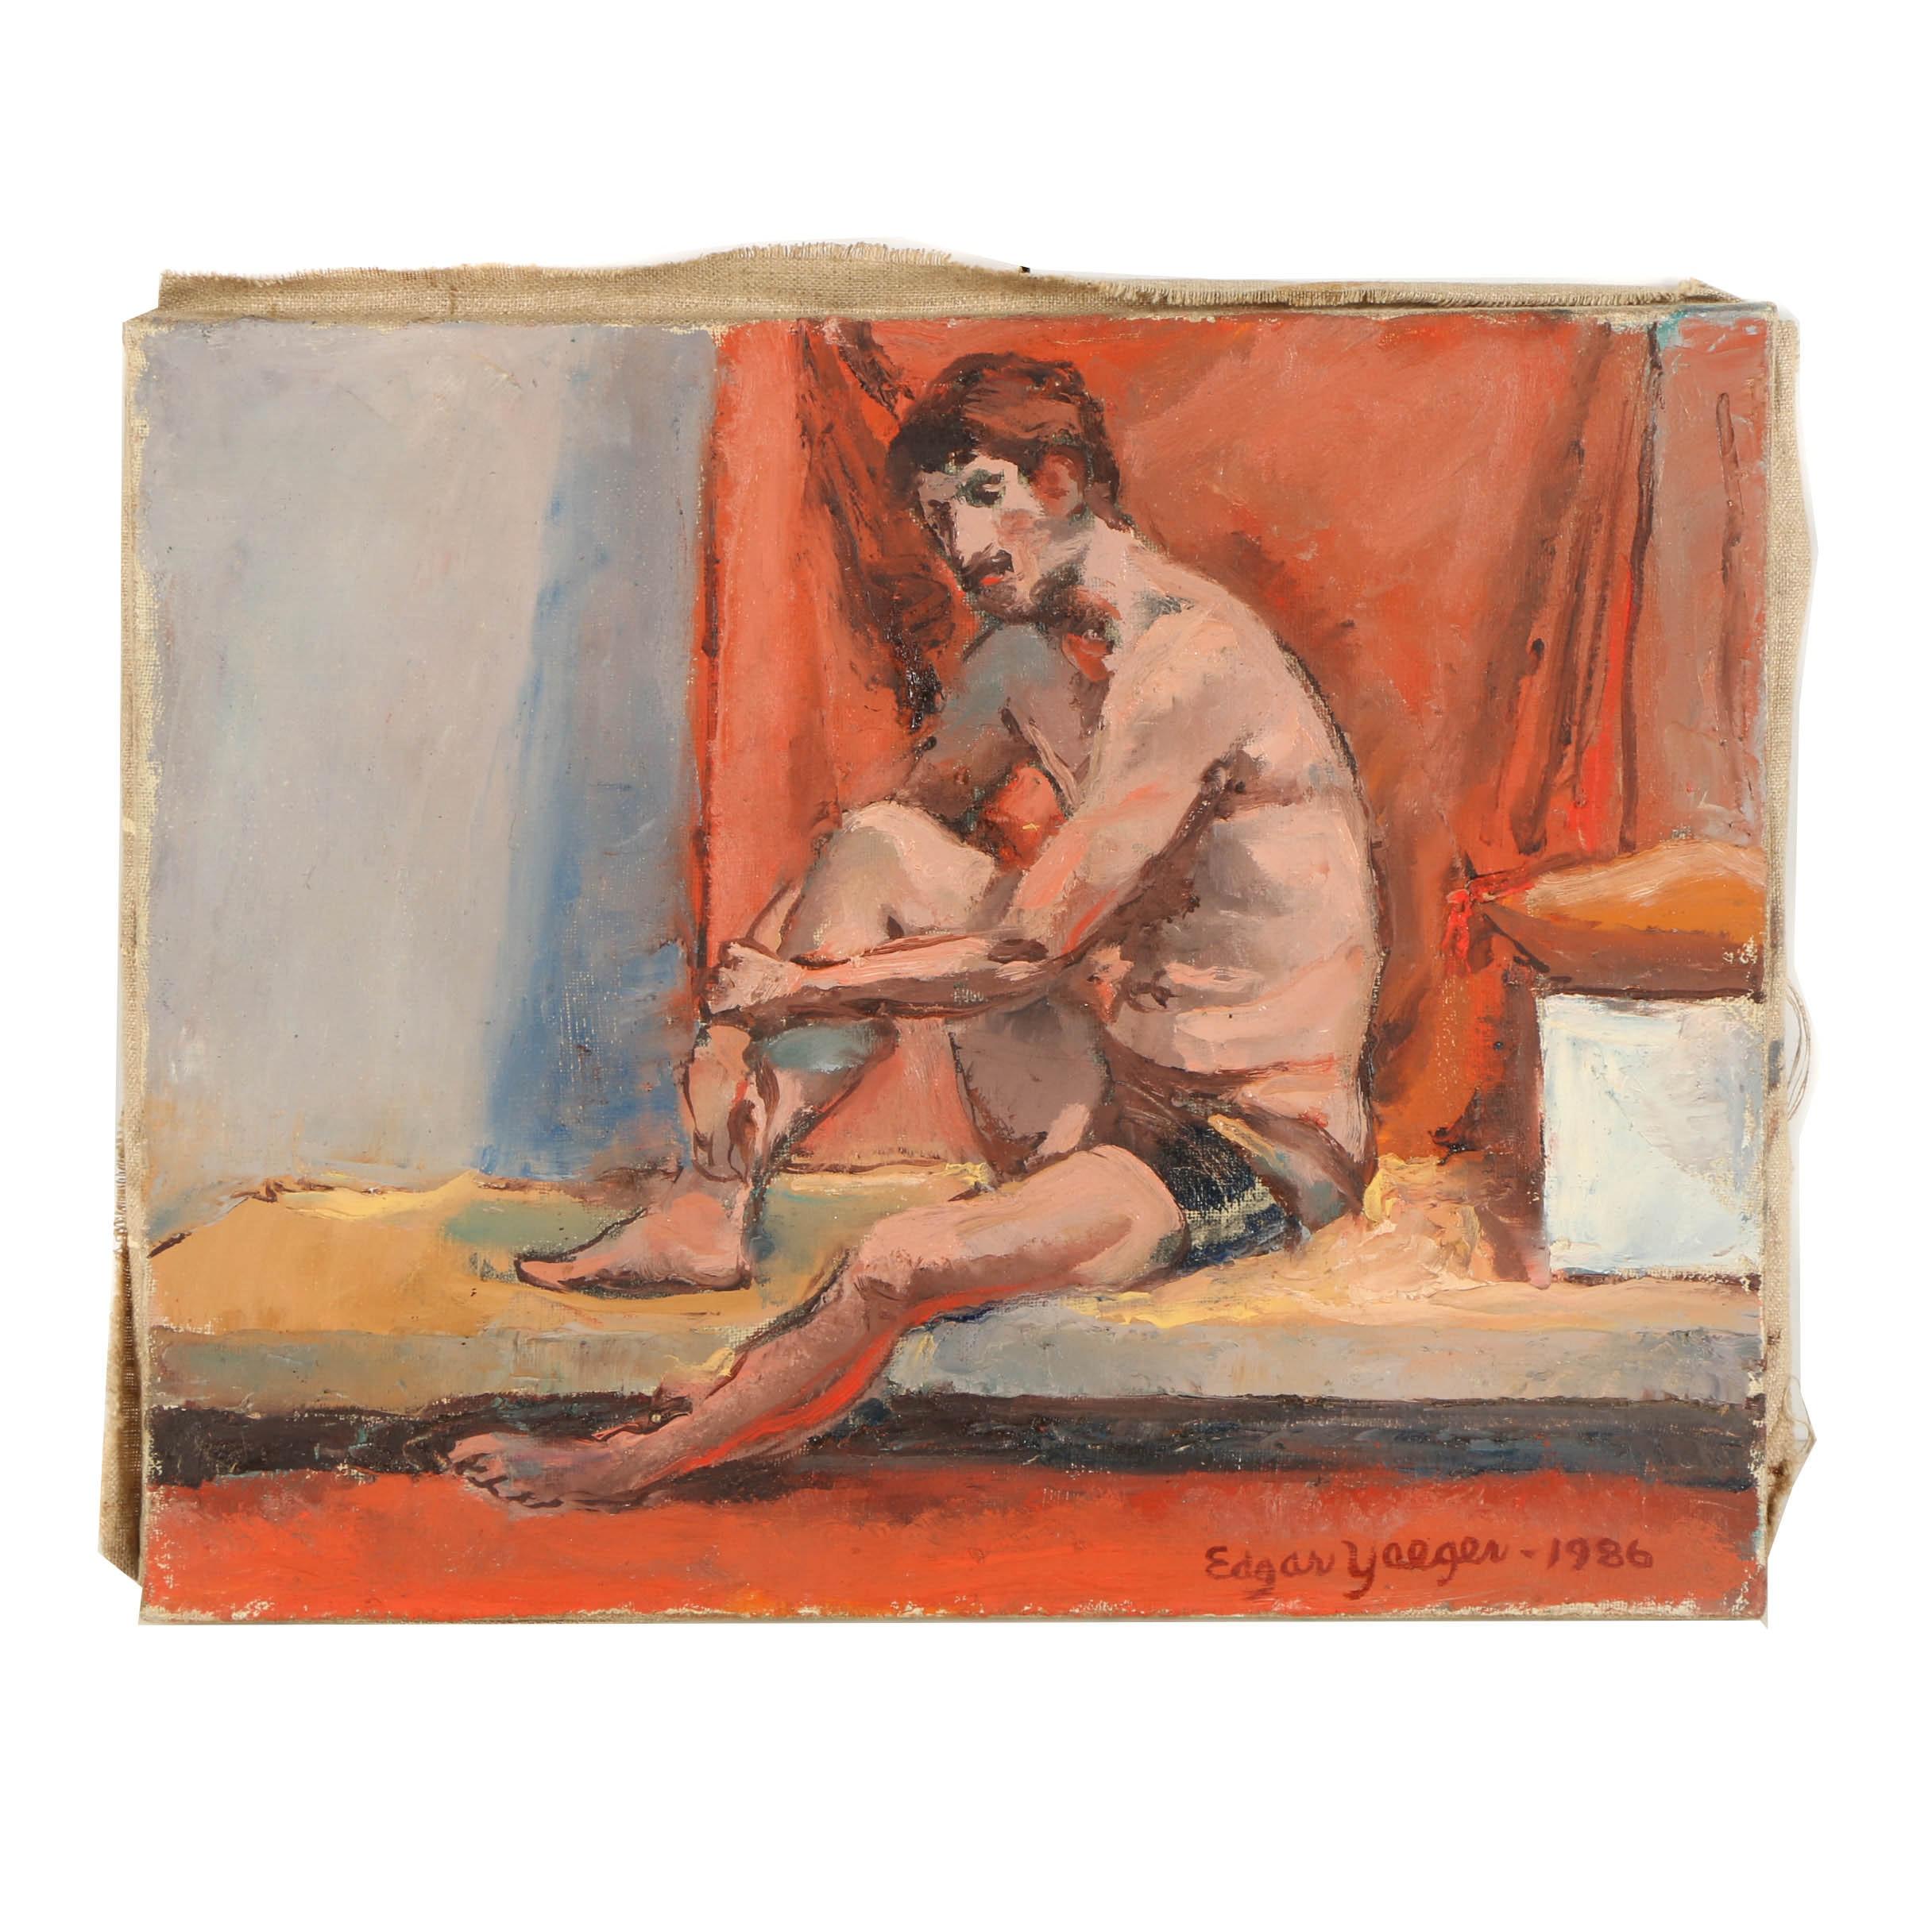 Edgar Yaeger Oil Painting on Canvas Portrait of Male Figure